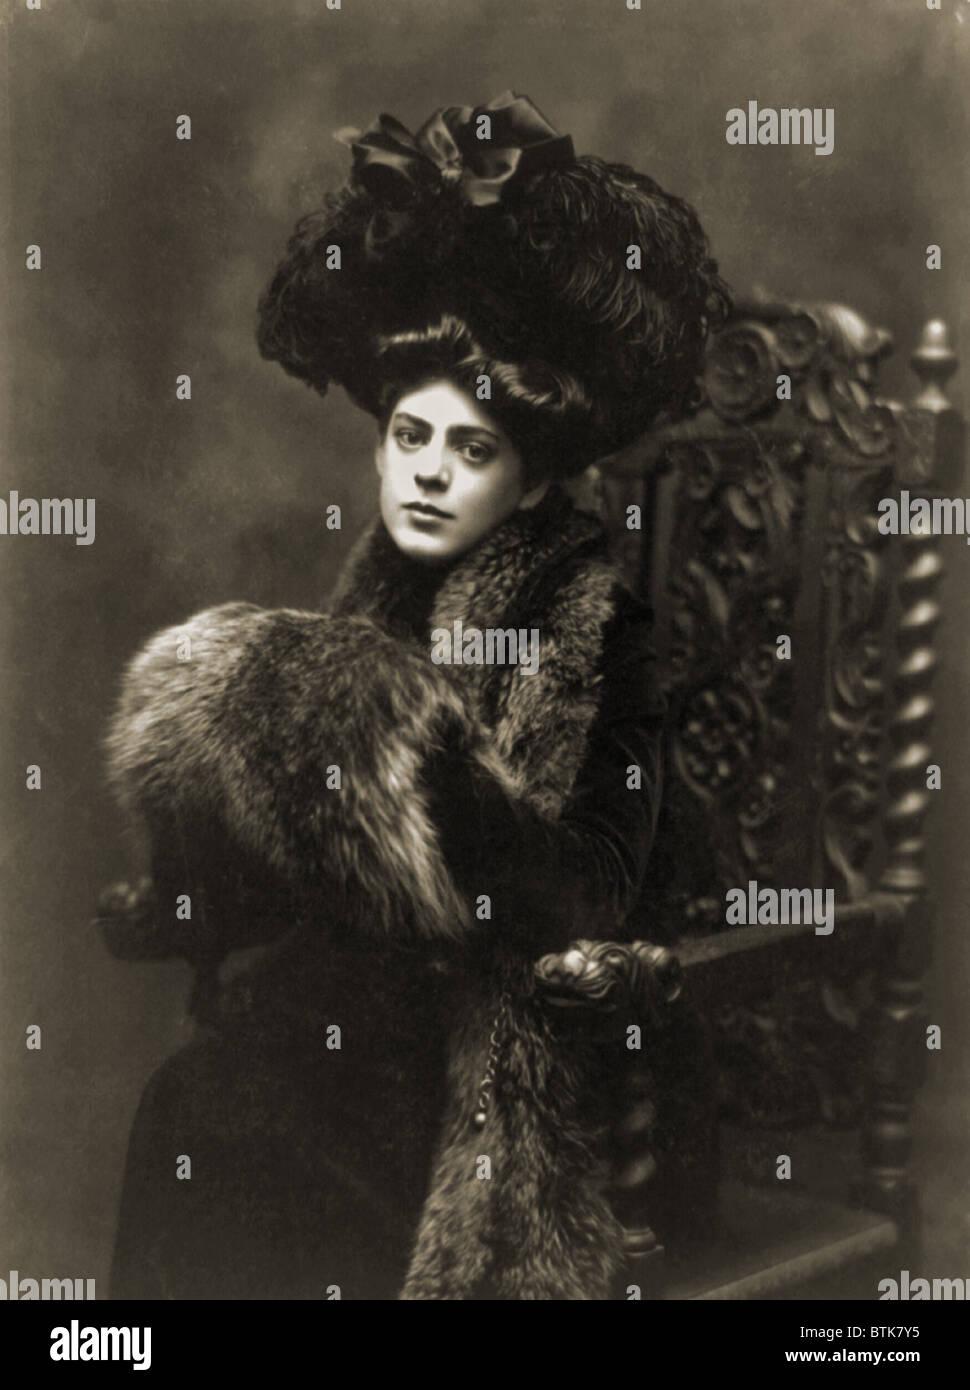 Ethel Barrymore (1879-1959), in a 1901 studio portrait by Burr McIntosh. Stock Photo